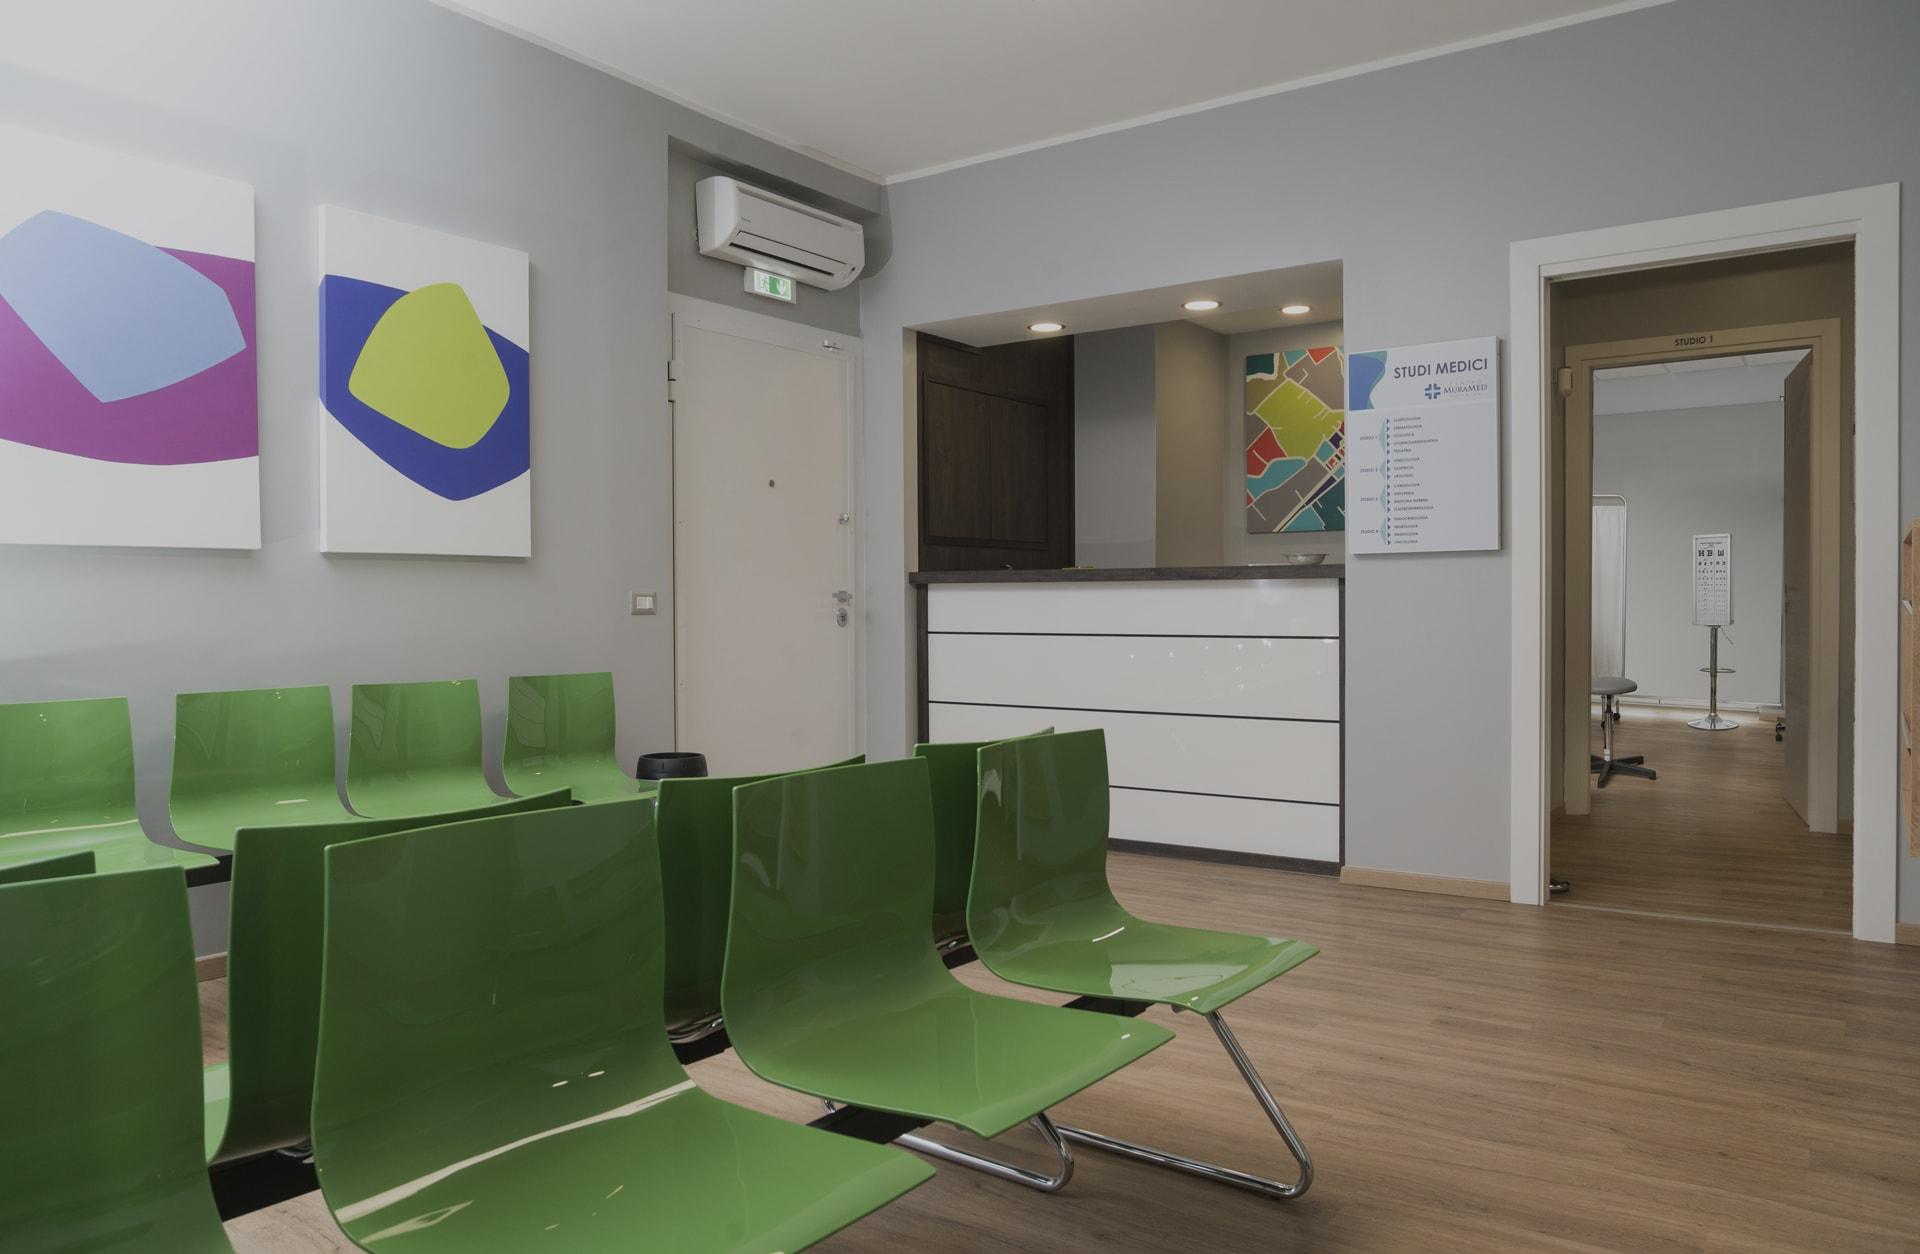 centro-medico-muramed-sora-frosinone-medico-visita-specializzata